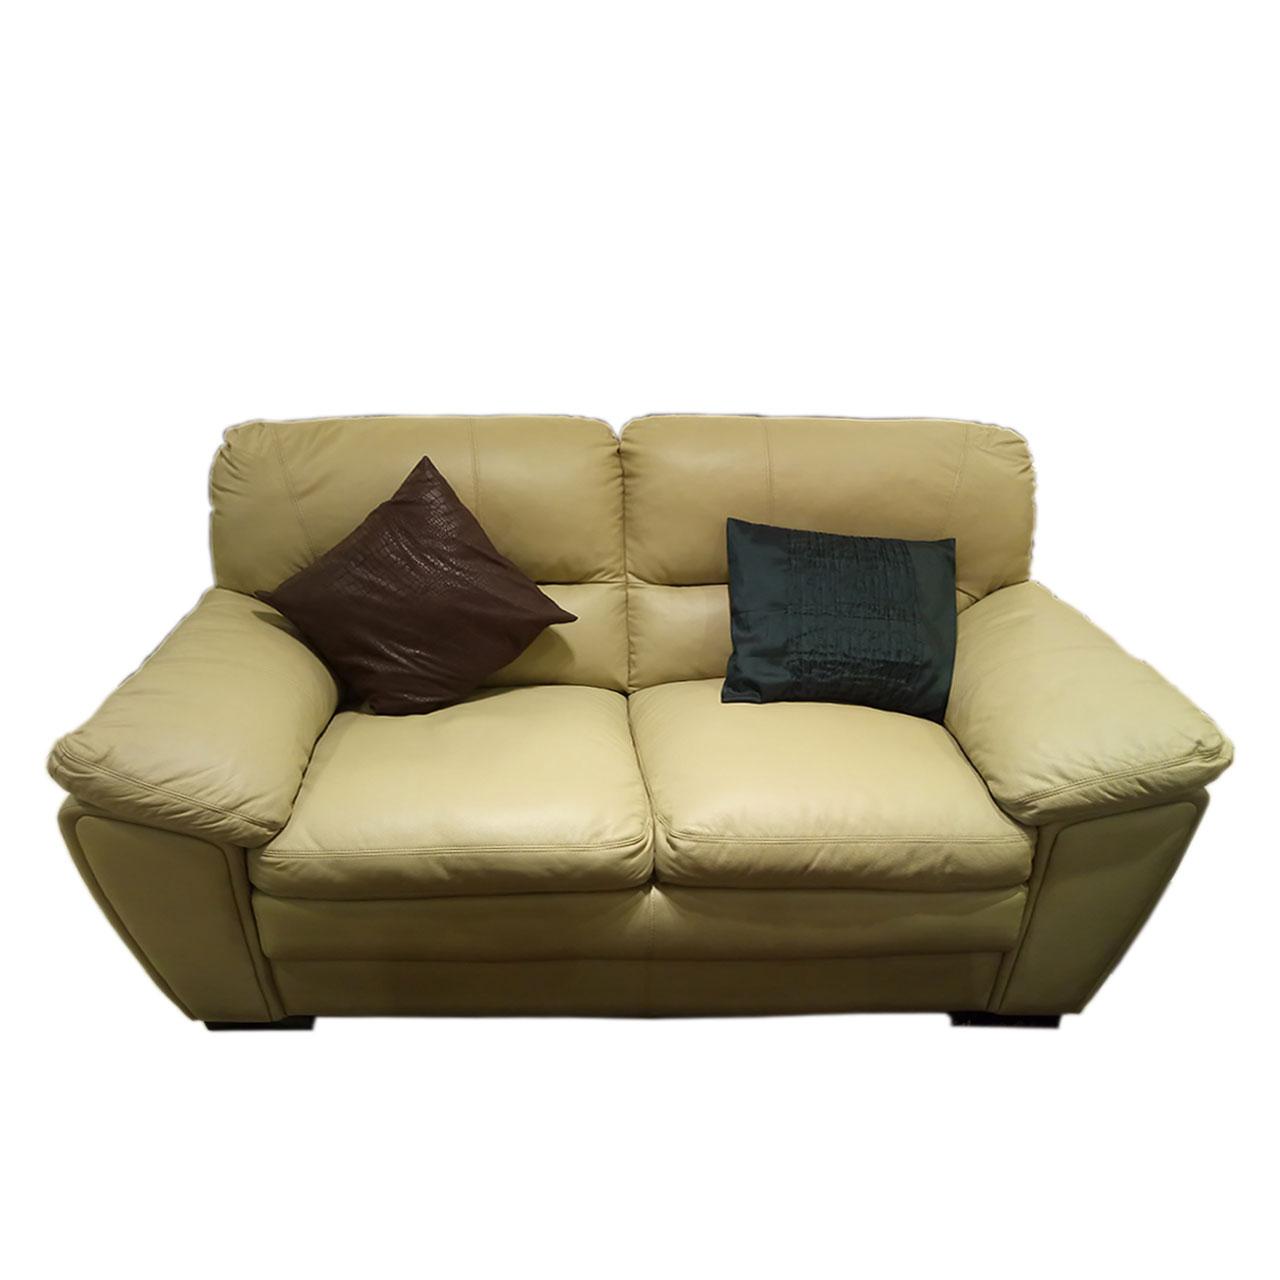 sabrina sofa corner bed cyprus furniture store manila philippines urban